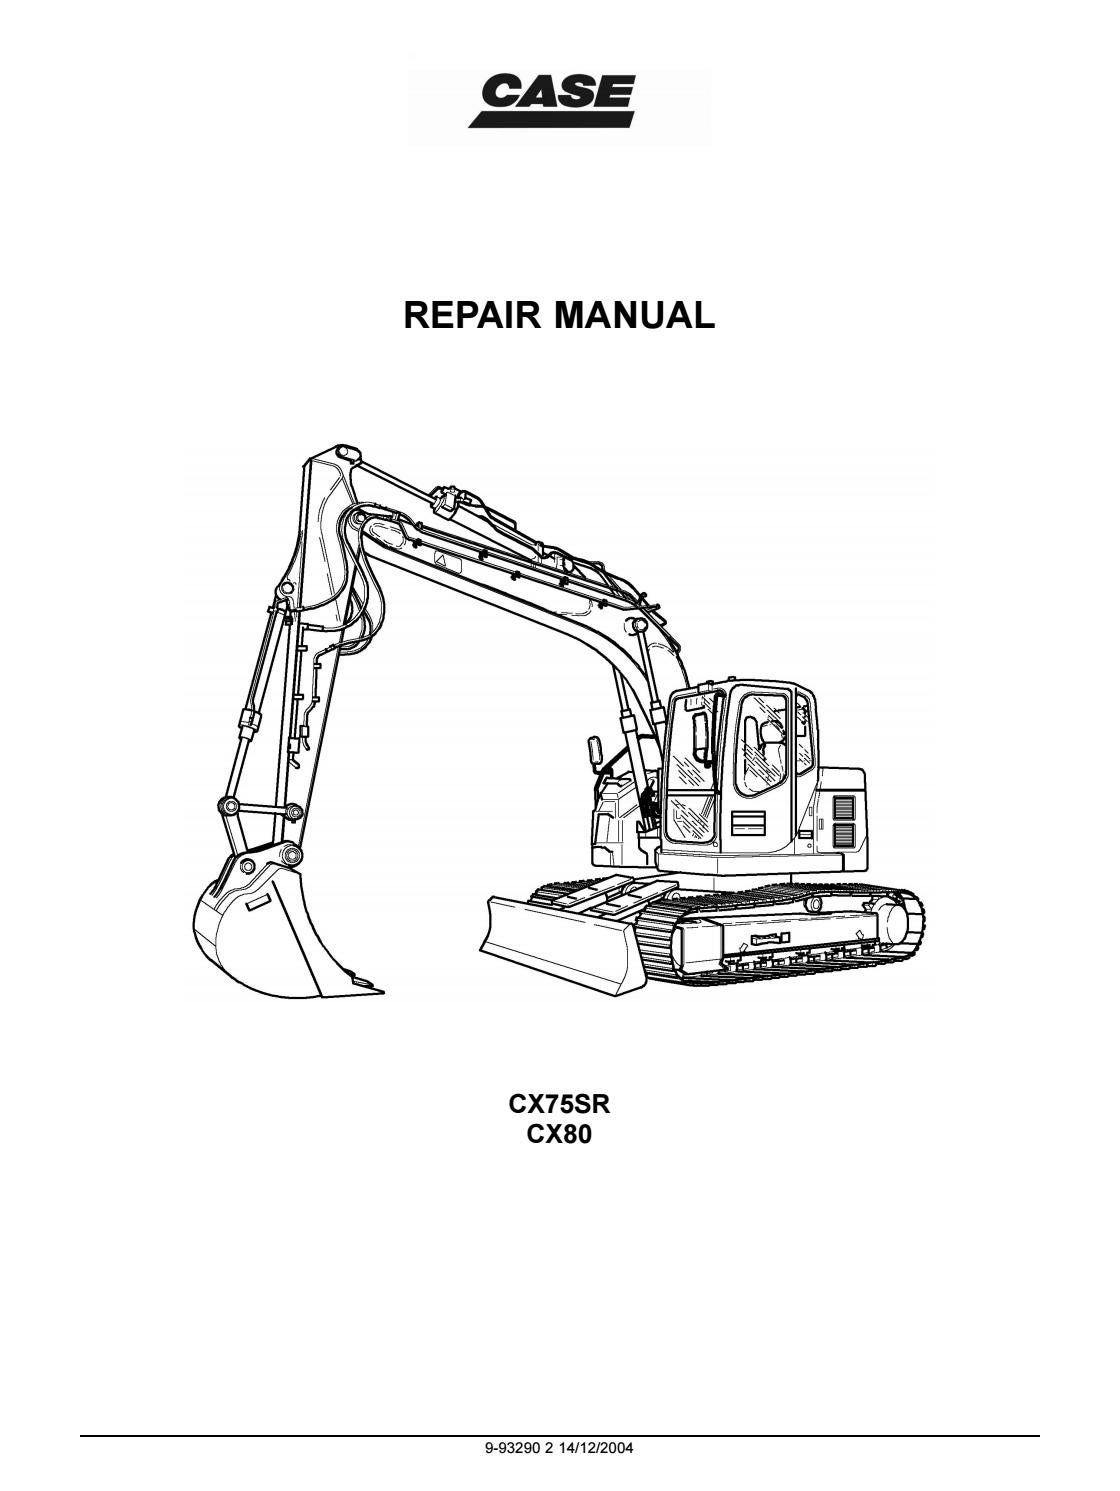 Case cx75sr crawler excavator service repair manual by